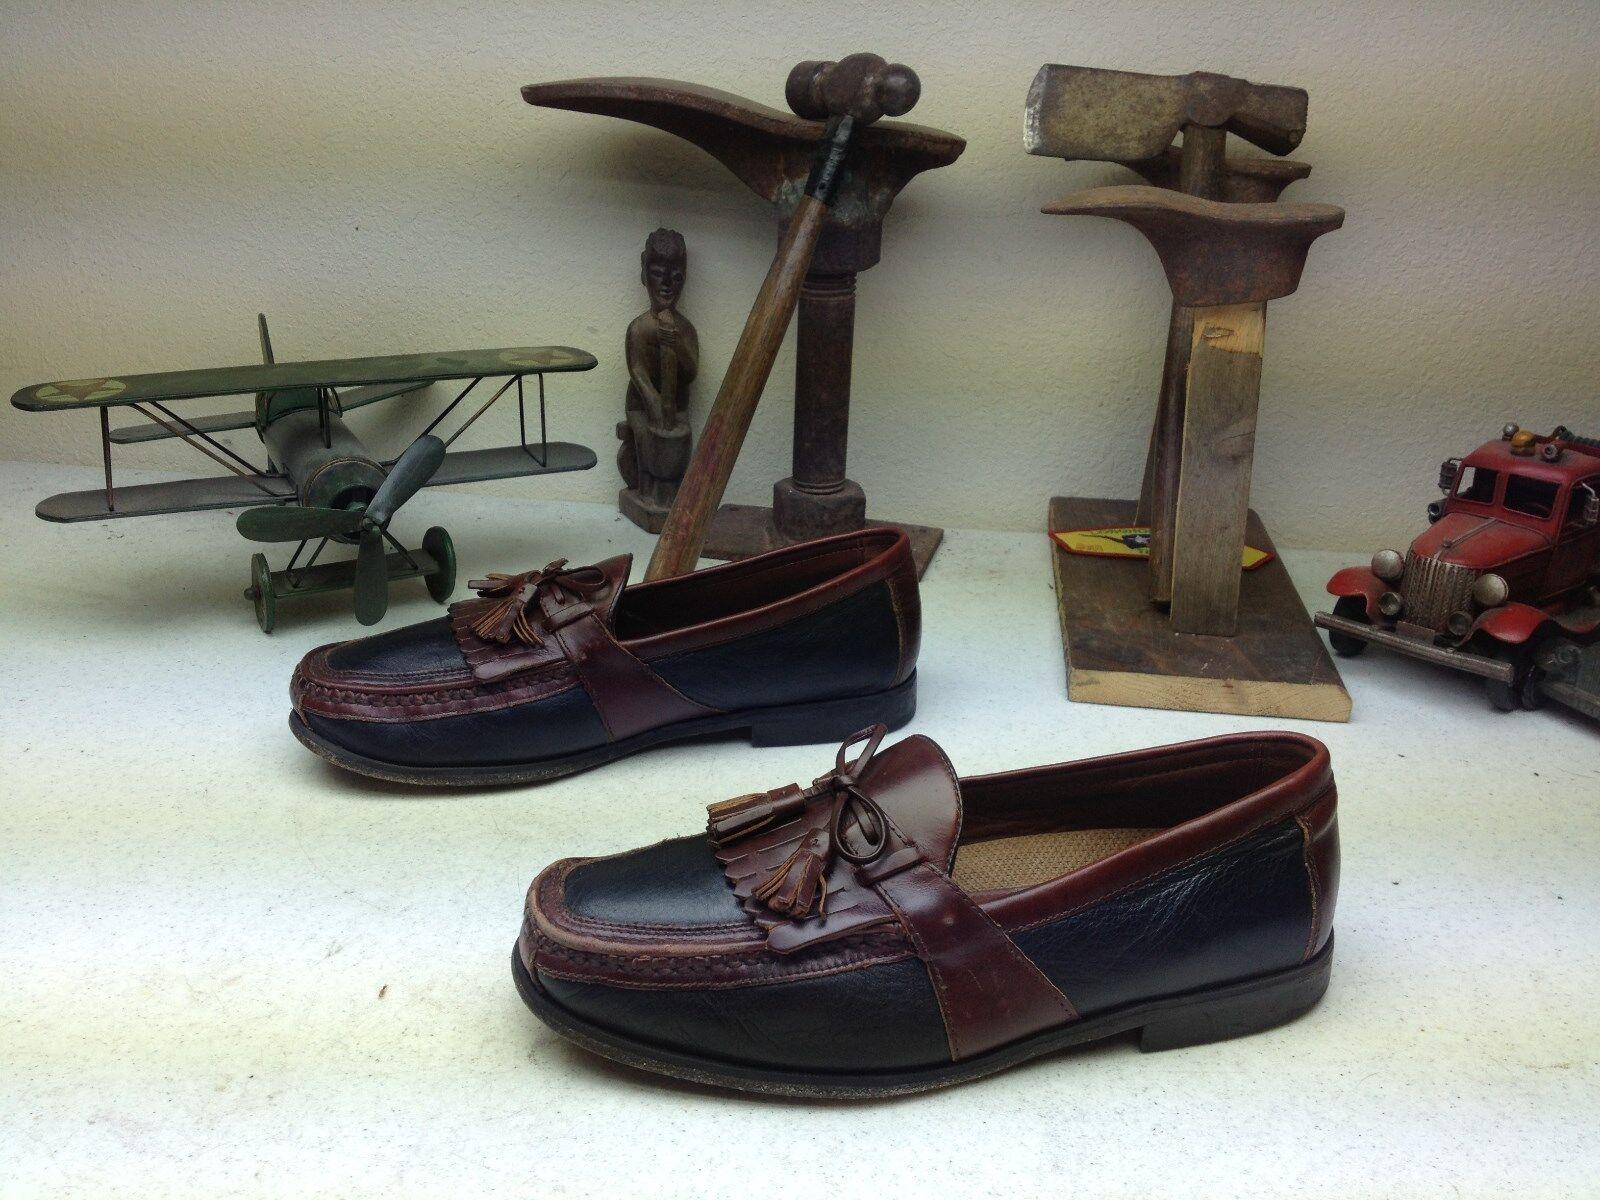 caldo JOHNSTONG & MURPHY MURPHY MURPHY SLIP ON LEATHER LOAFER TASSLE KILTIE DRIVING scarpe 10.5E  fabbrica diretta